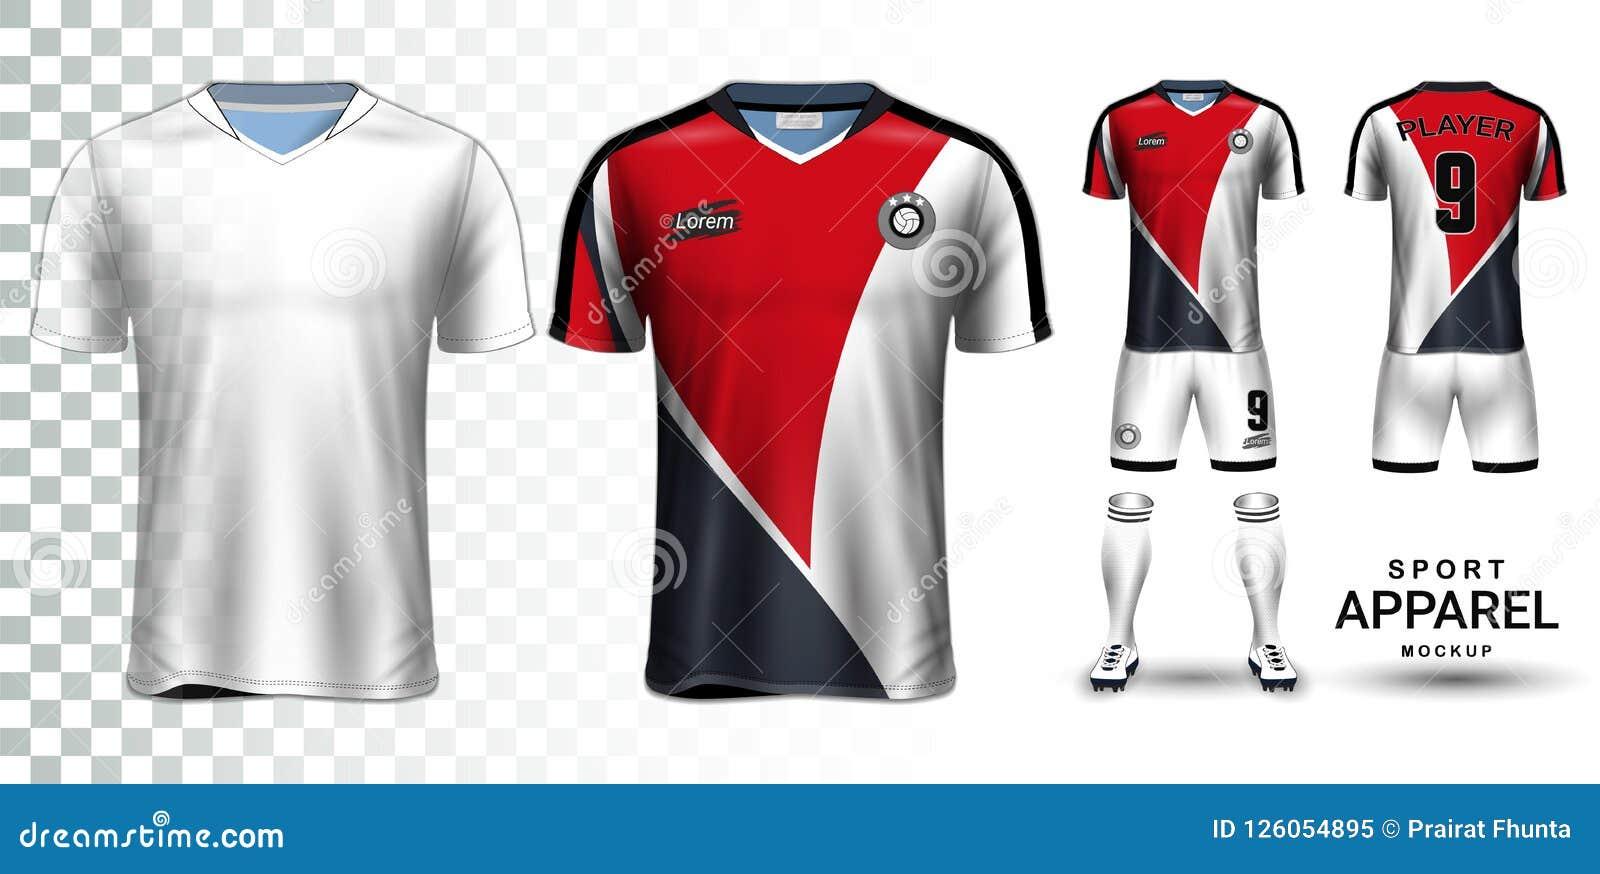 b759ef890 Soccer Jersey And Football Kit Presentation Mockup Template Stock ...